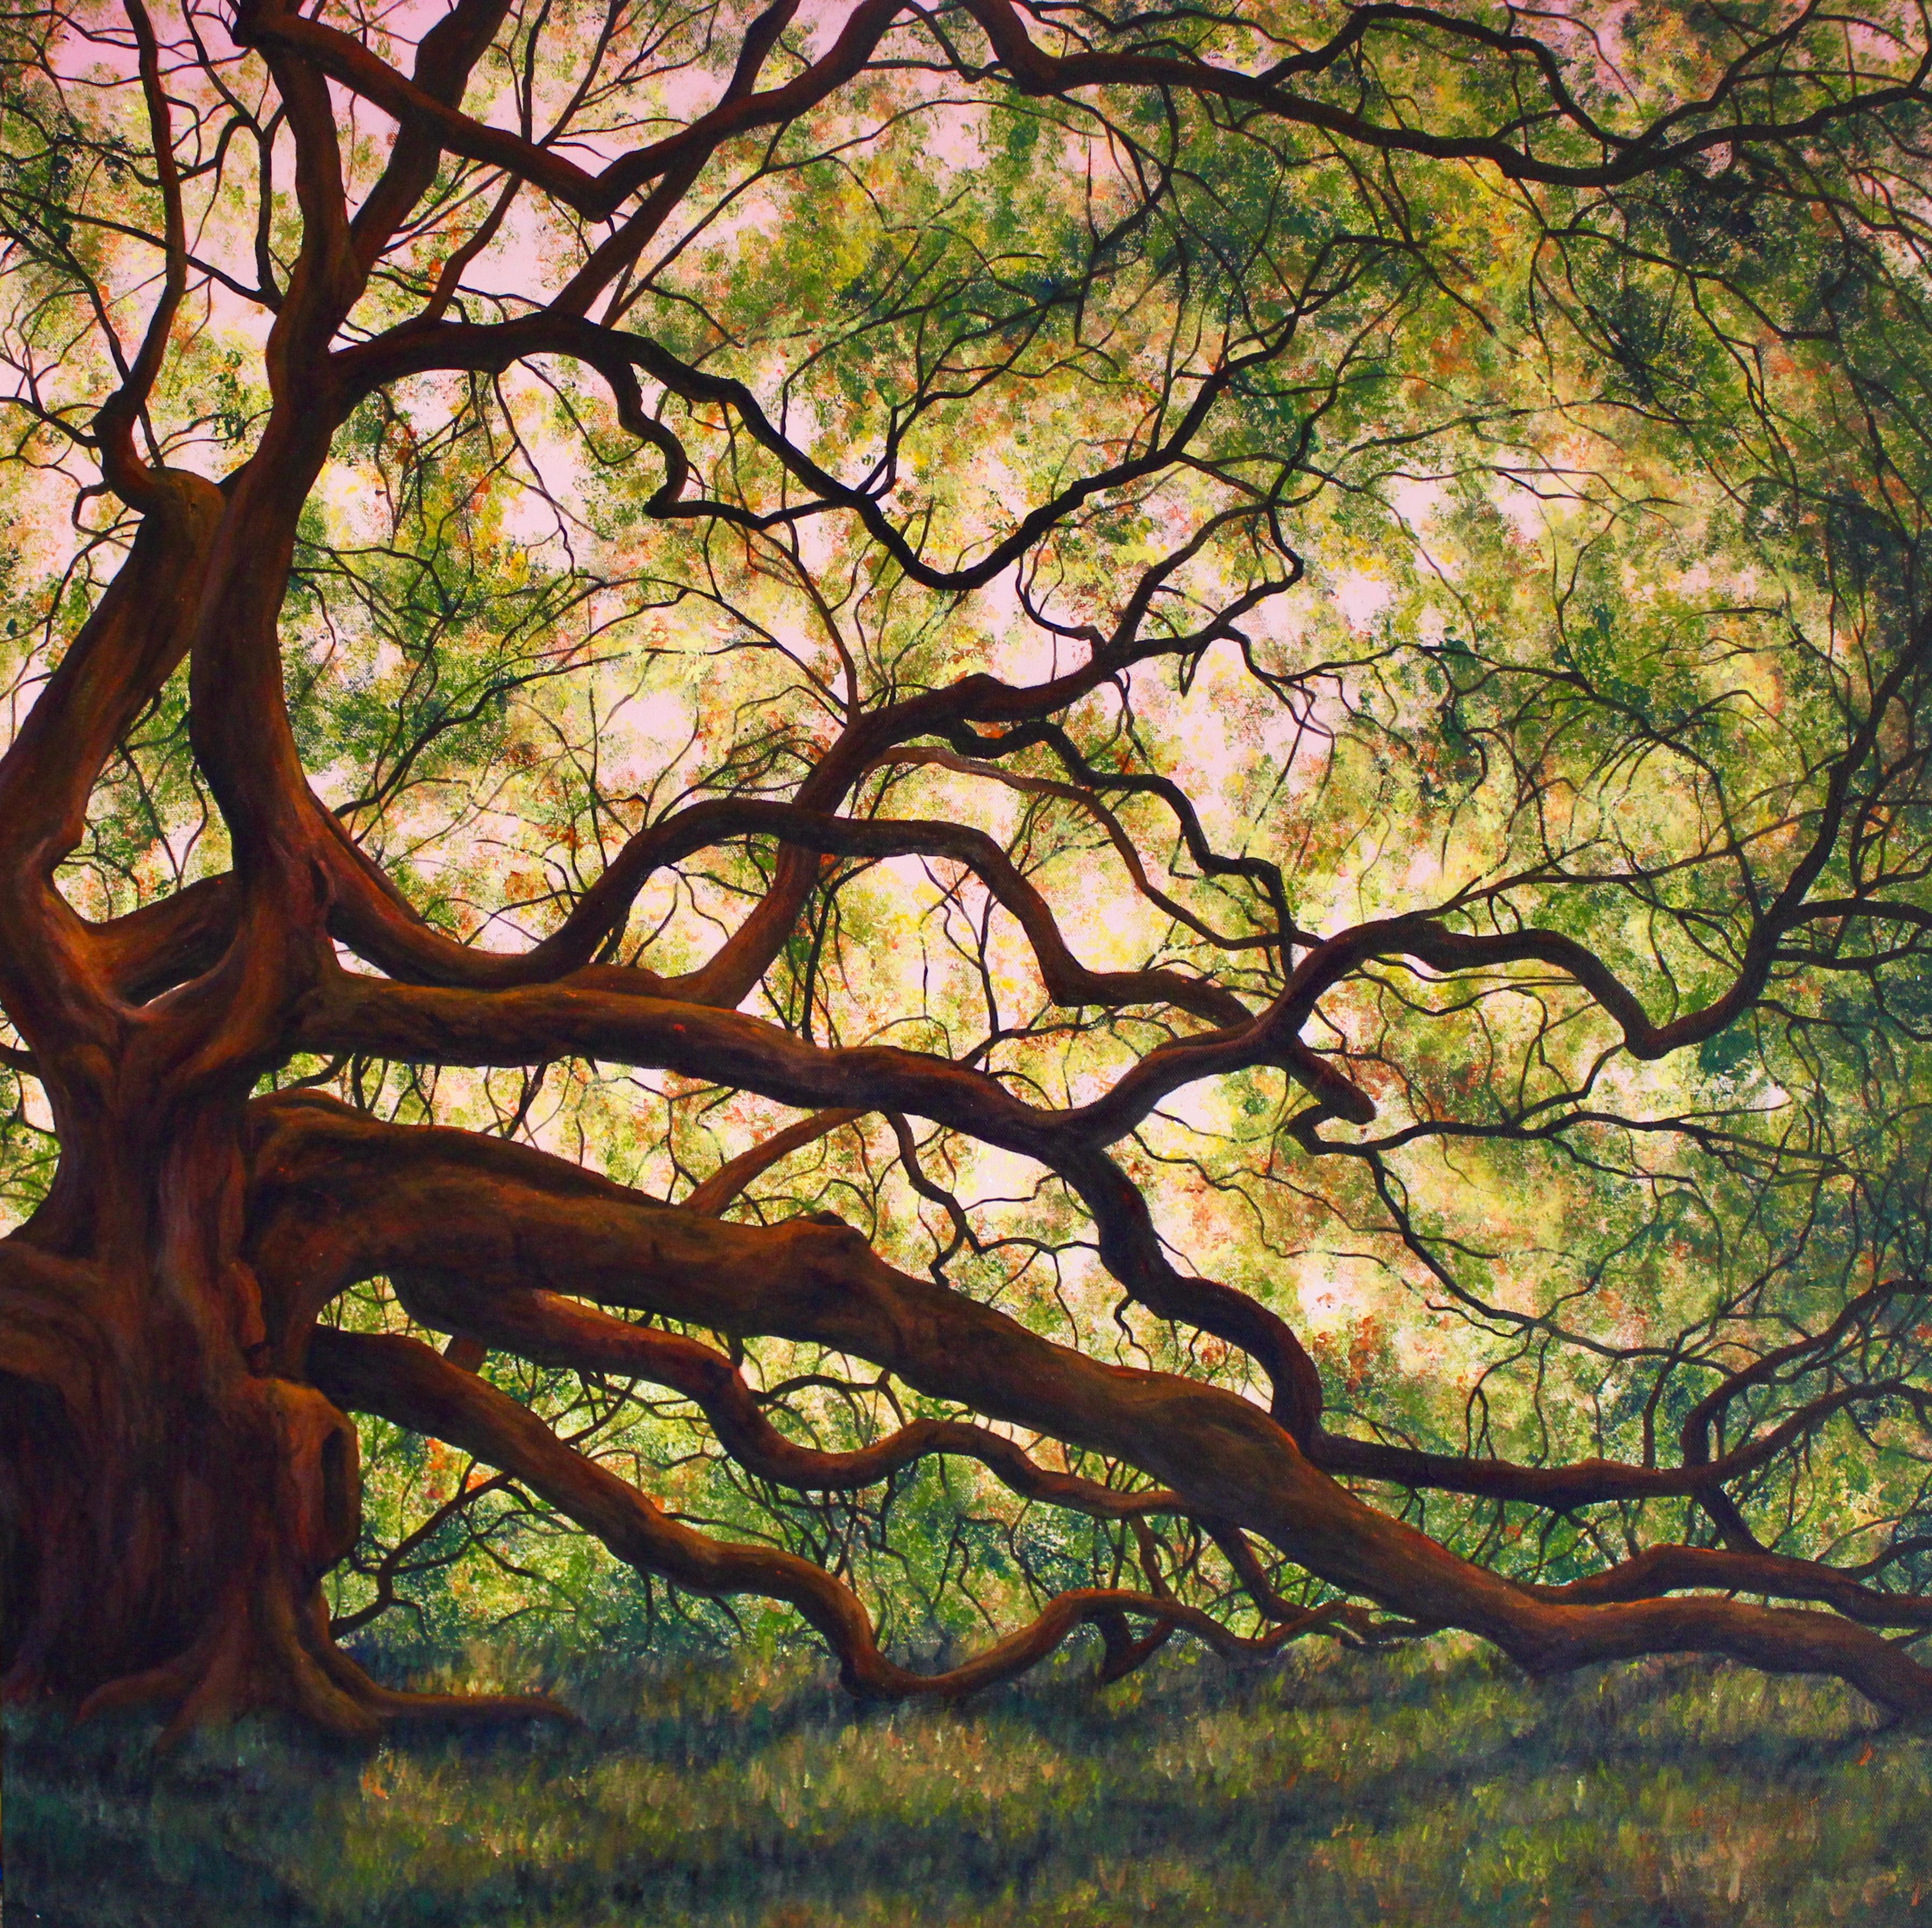 Arboreal Prism